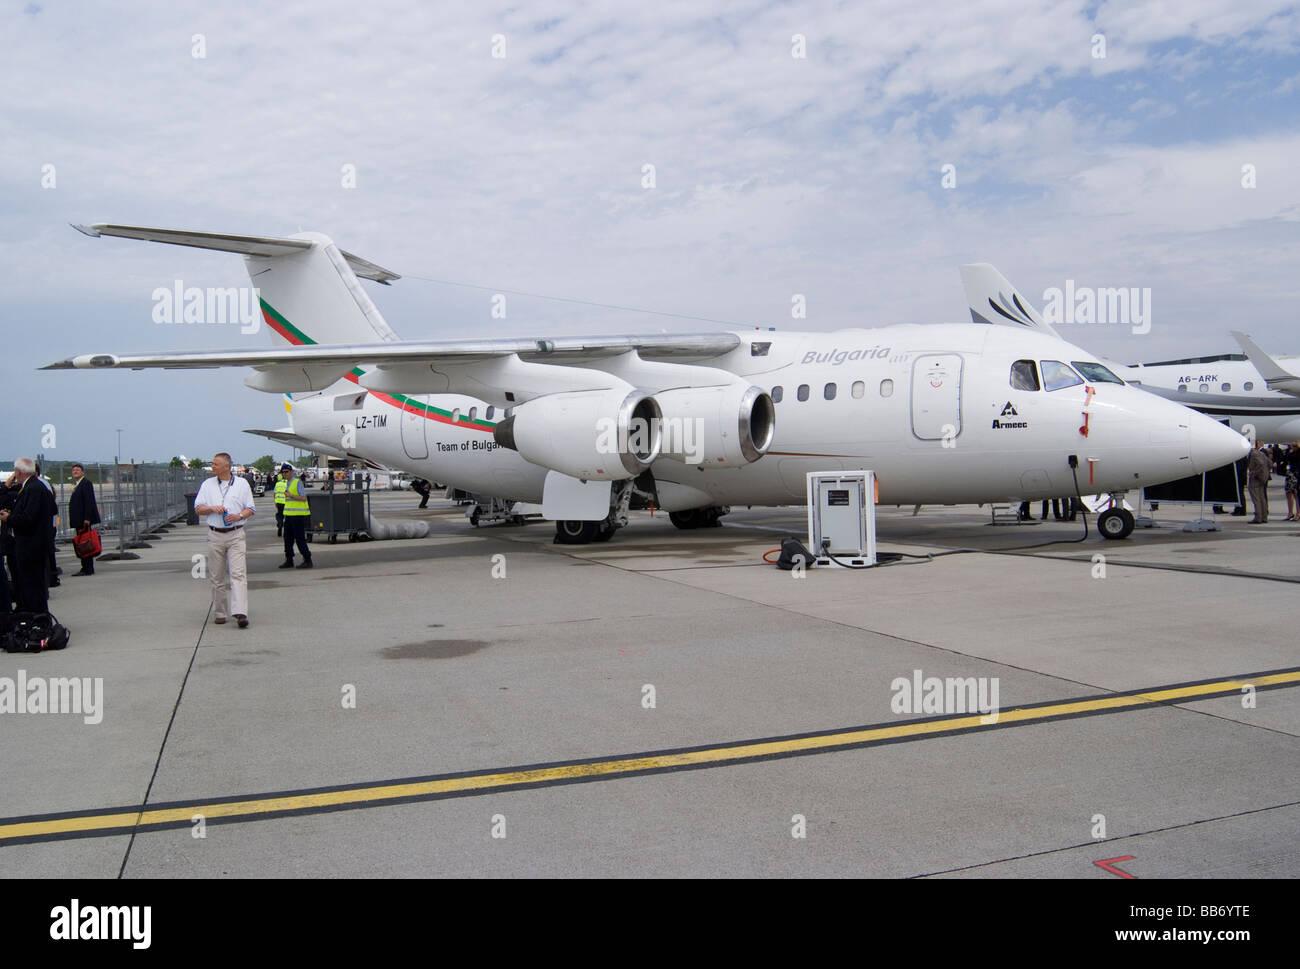 British Aerospace Avro RJ70 BAe Business Jet LZ-TIM at EBACE Aircraft Trade Show at Geneva Airport Switzerland - Stock Image